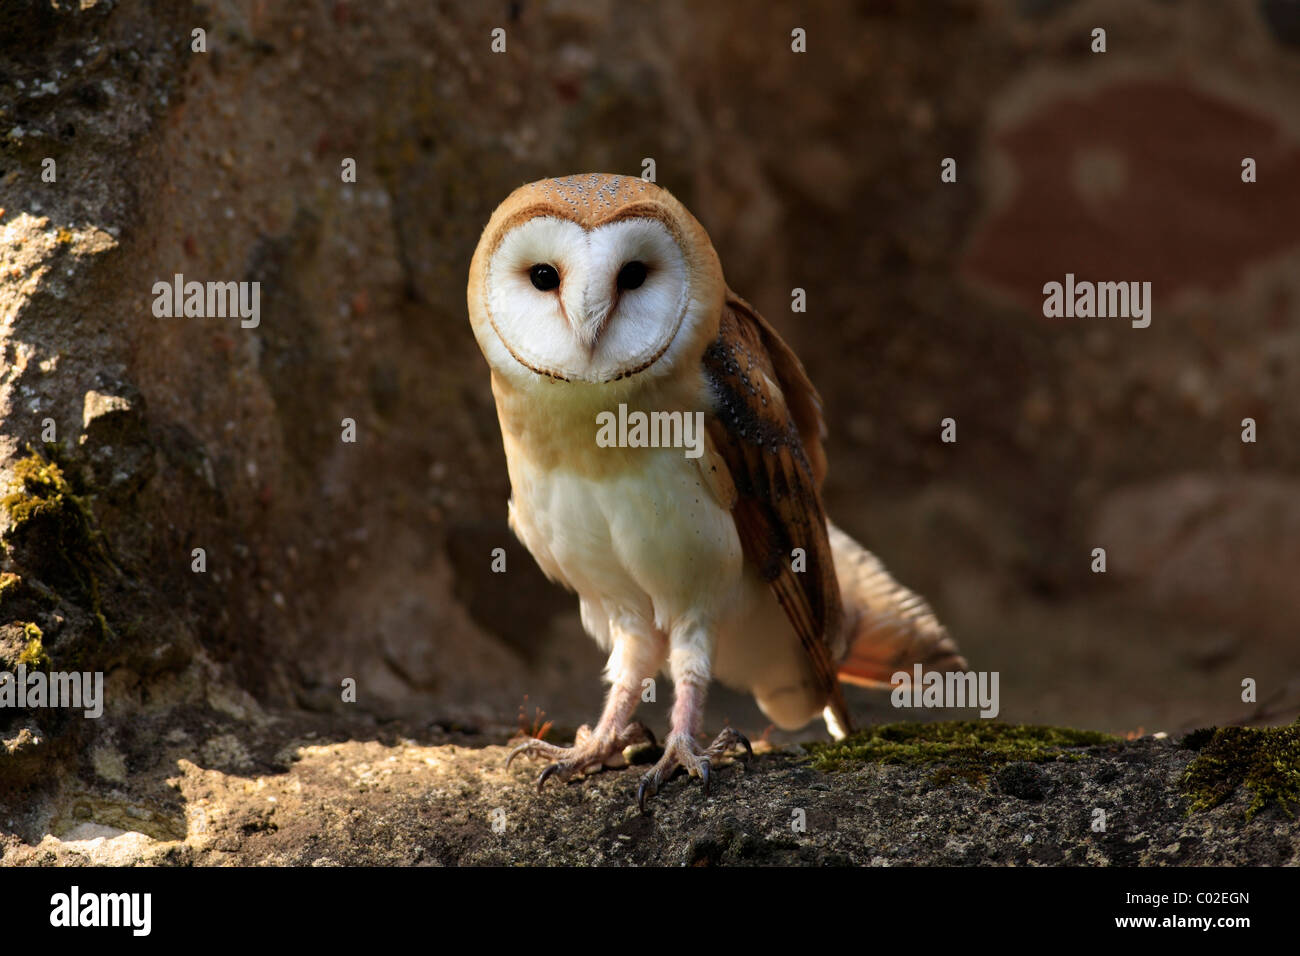 Barn Owl (Tyto alba), adult, Germany, Europe Stock Photo